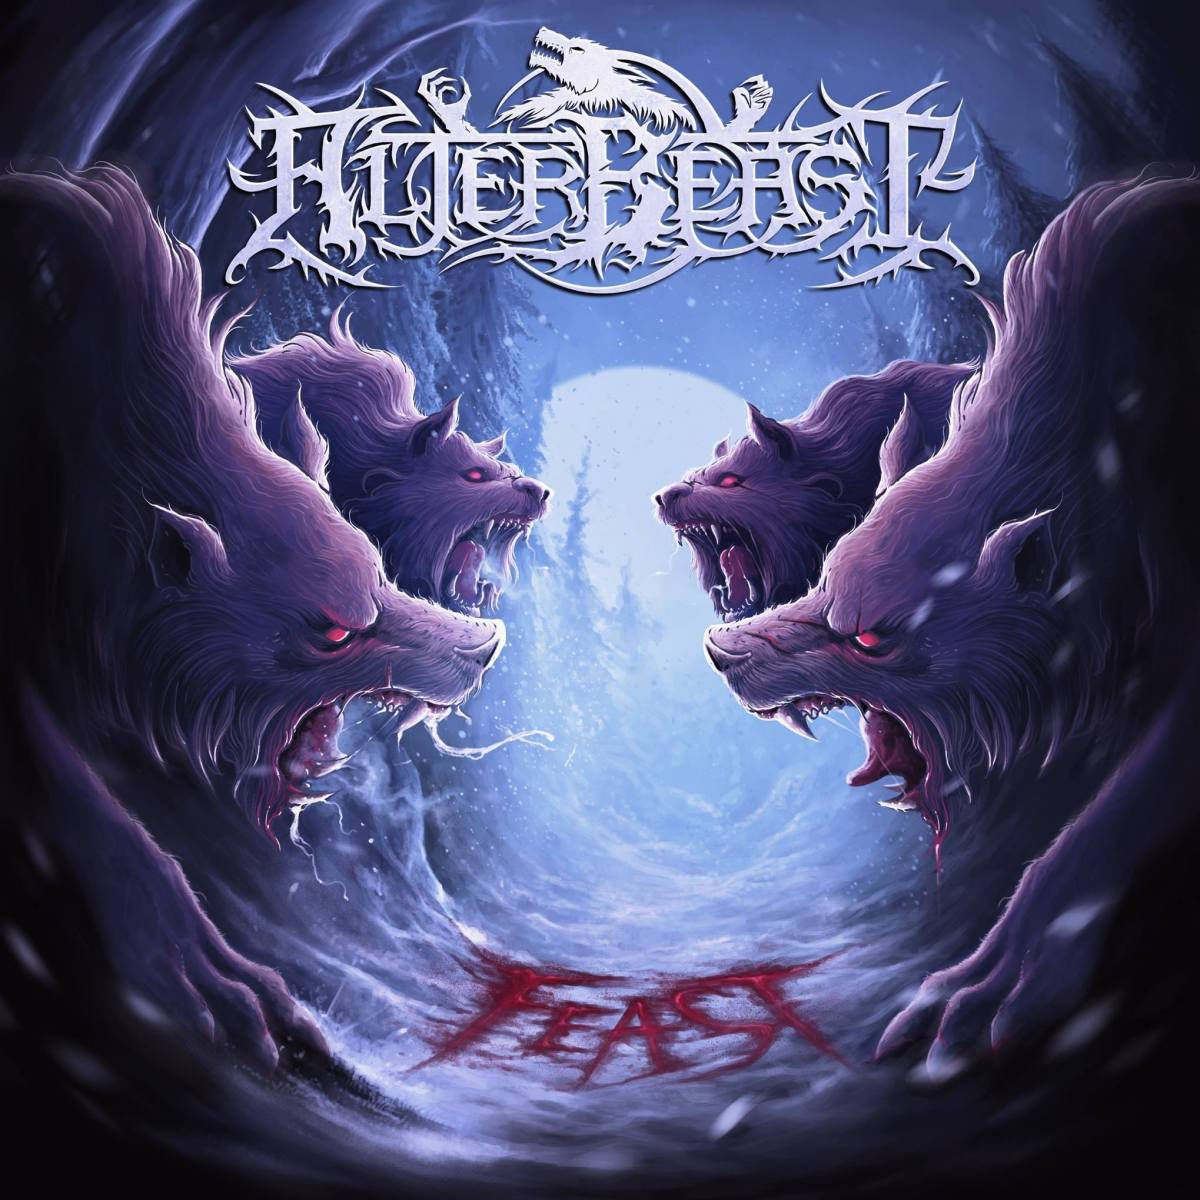 Alterbeast- Feast